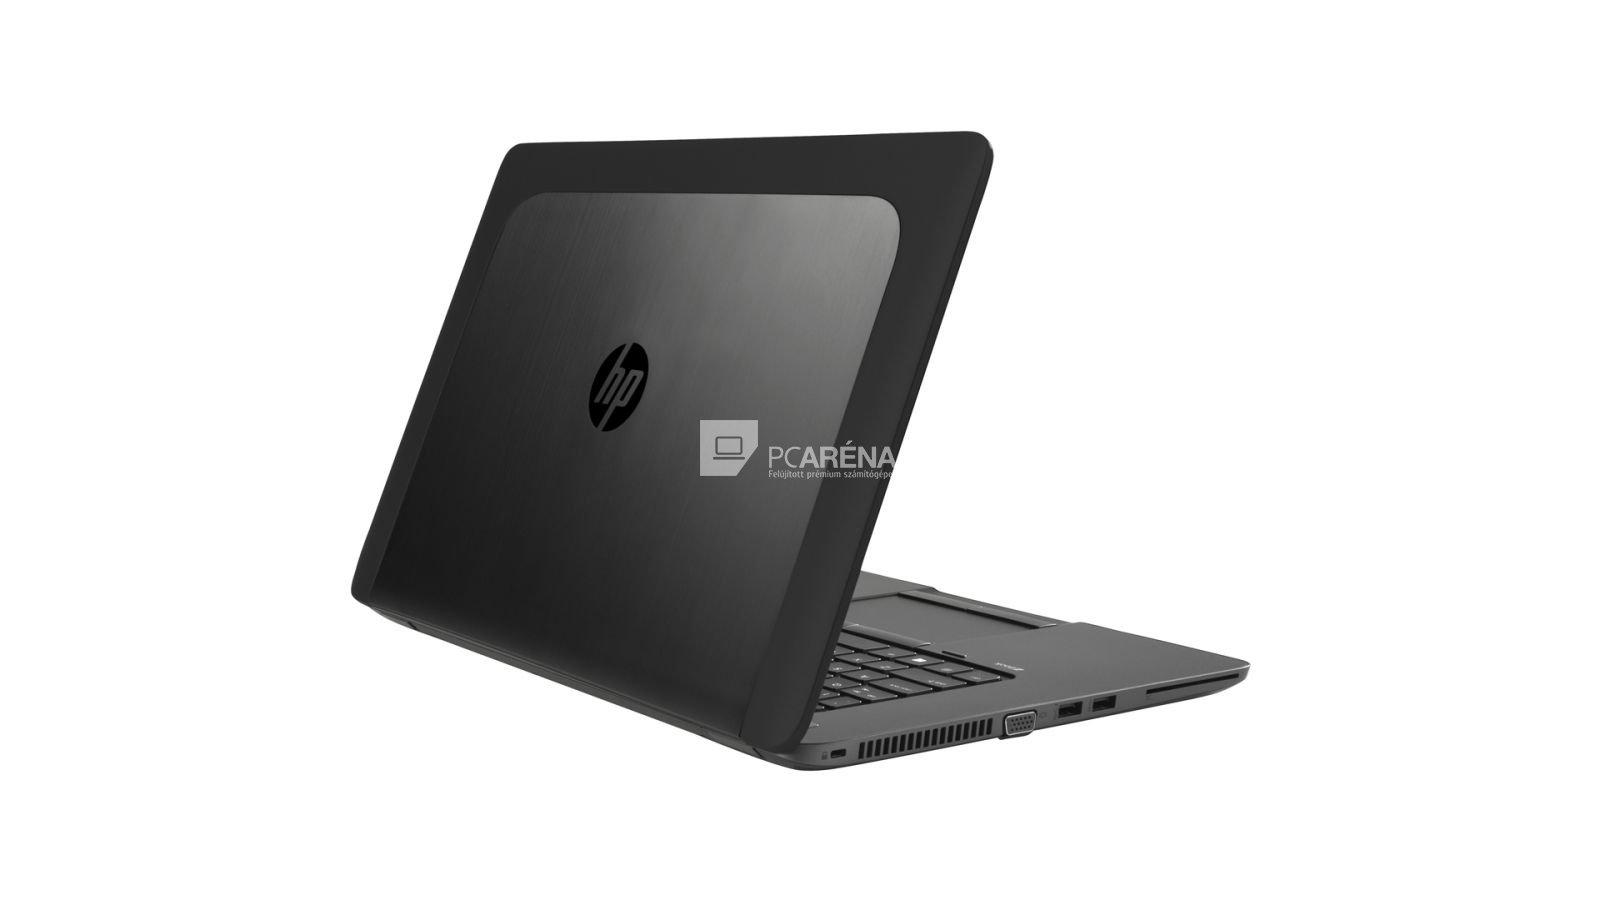 HP ZBook 15 laptop